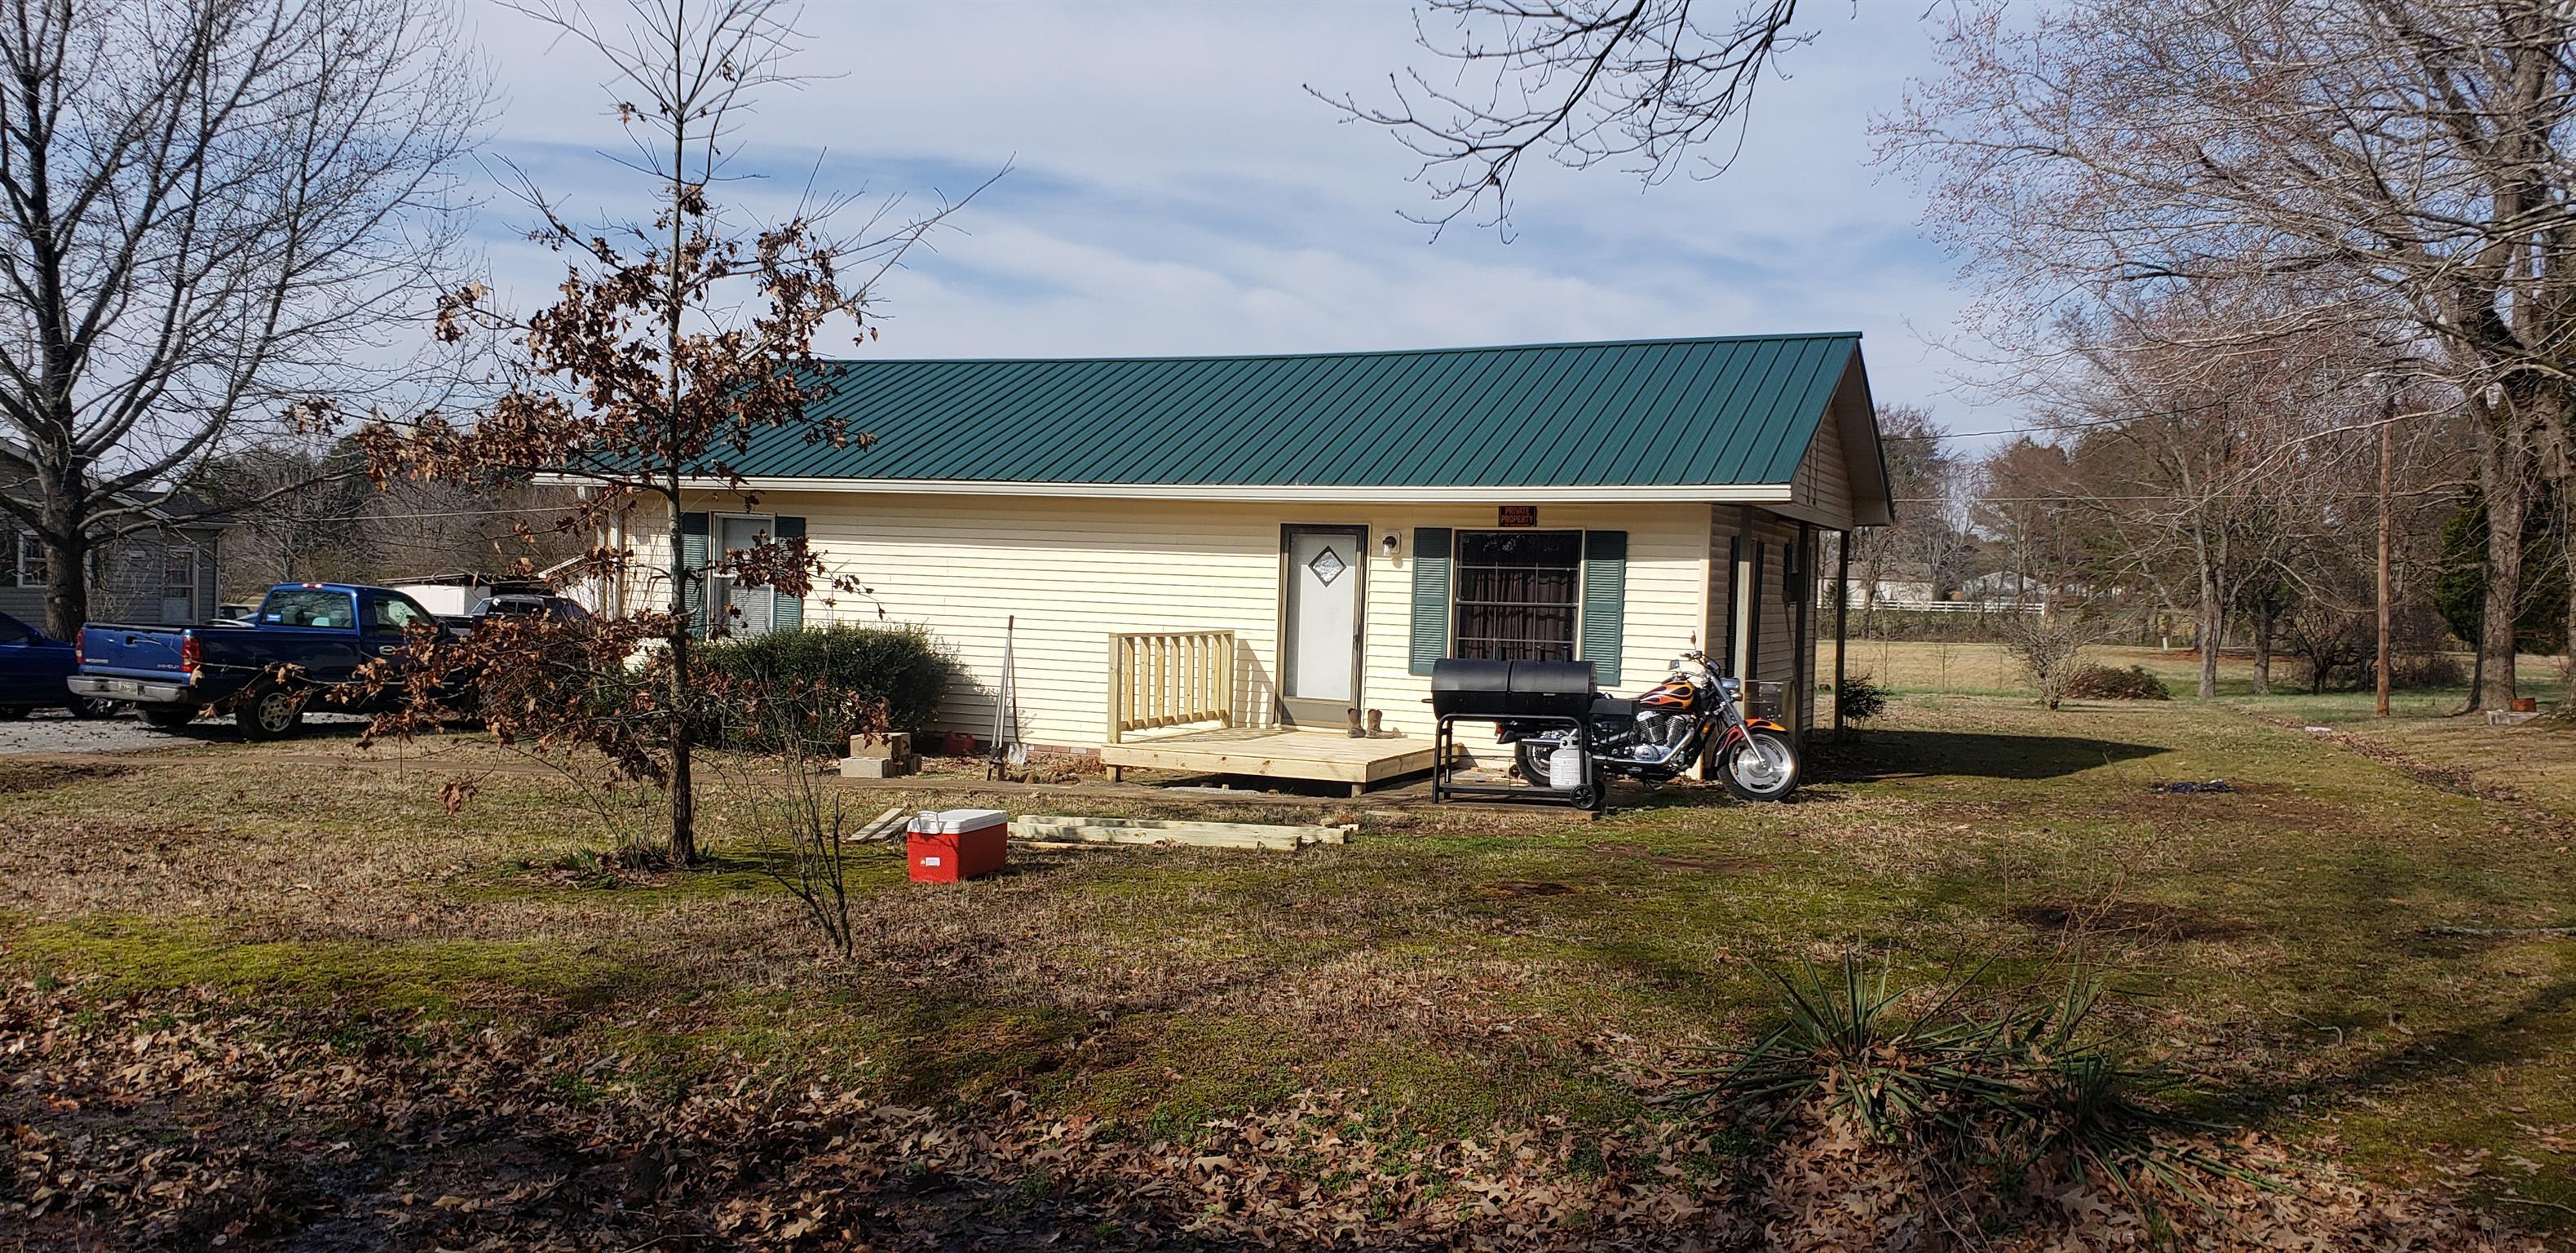 284 Watts Rd, New Johnsonville, TN 37134 - New Johnsonville, TN real estate listing